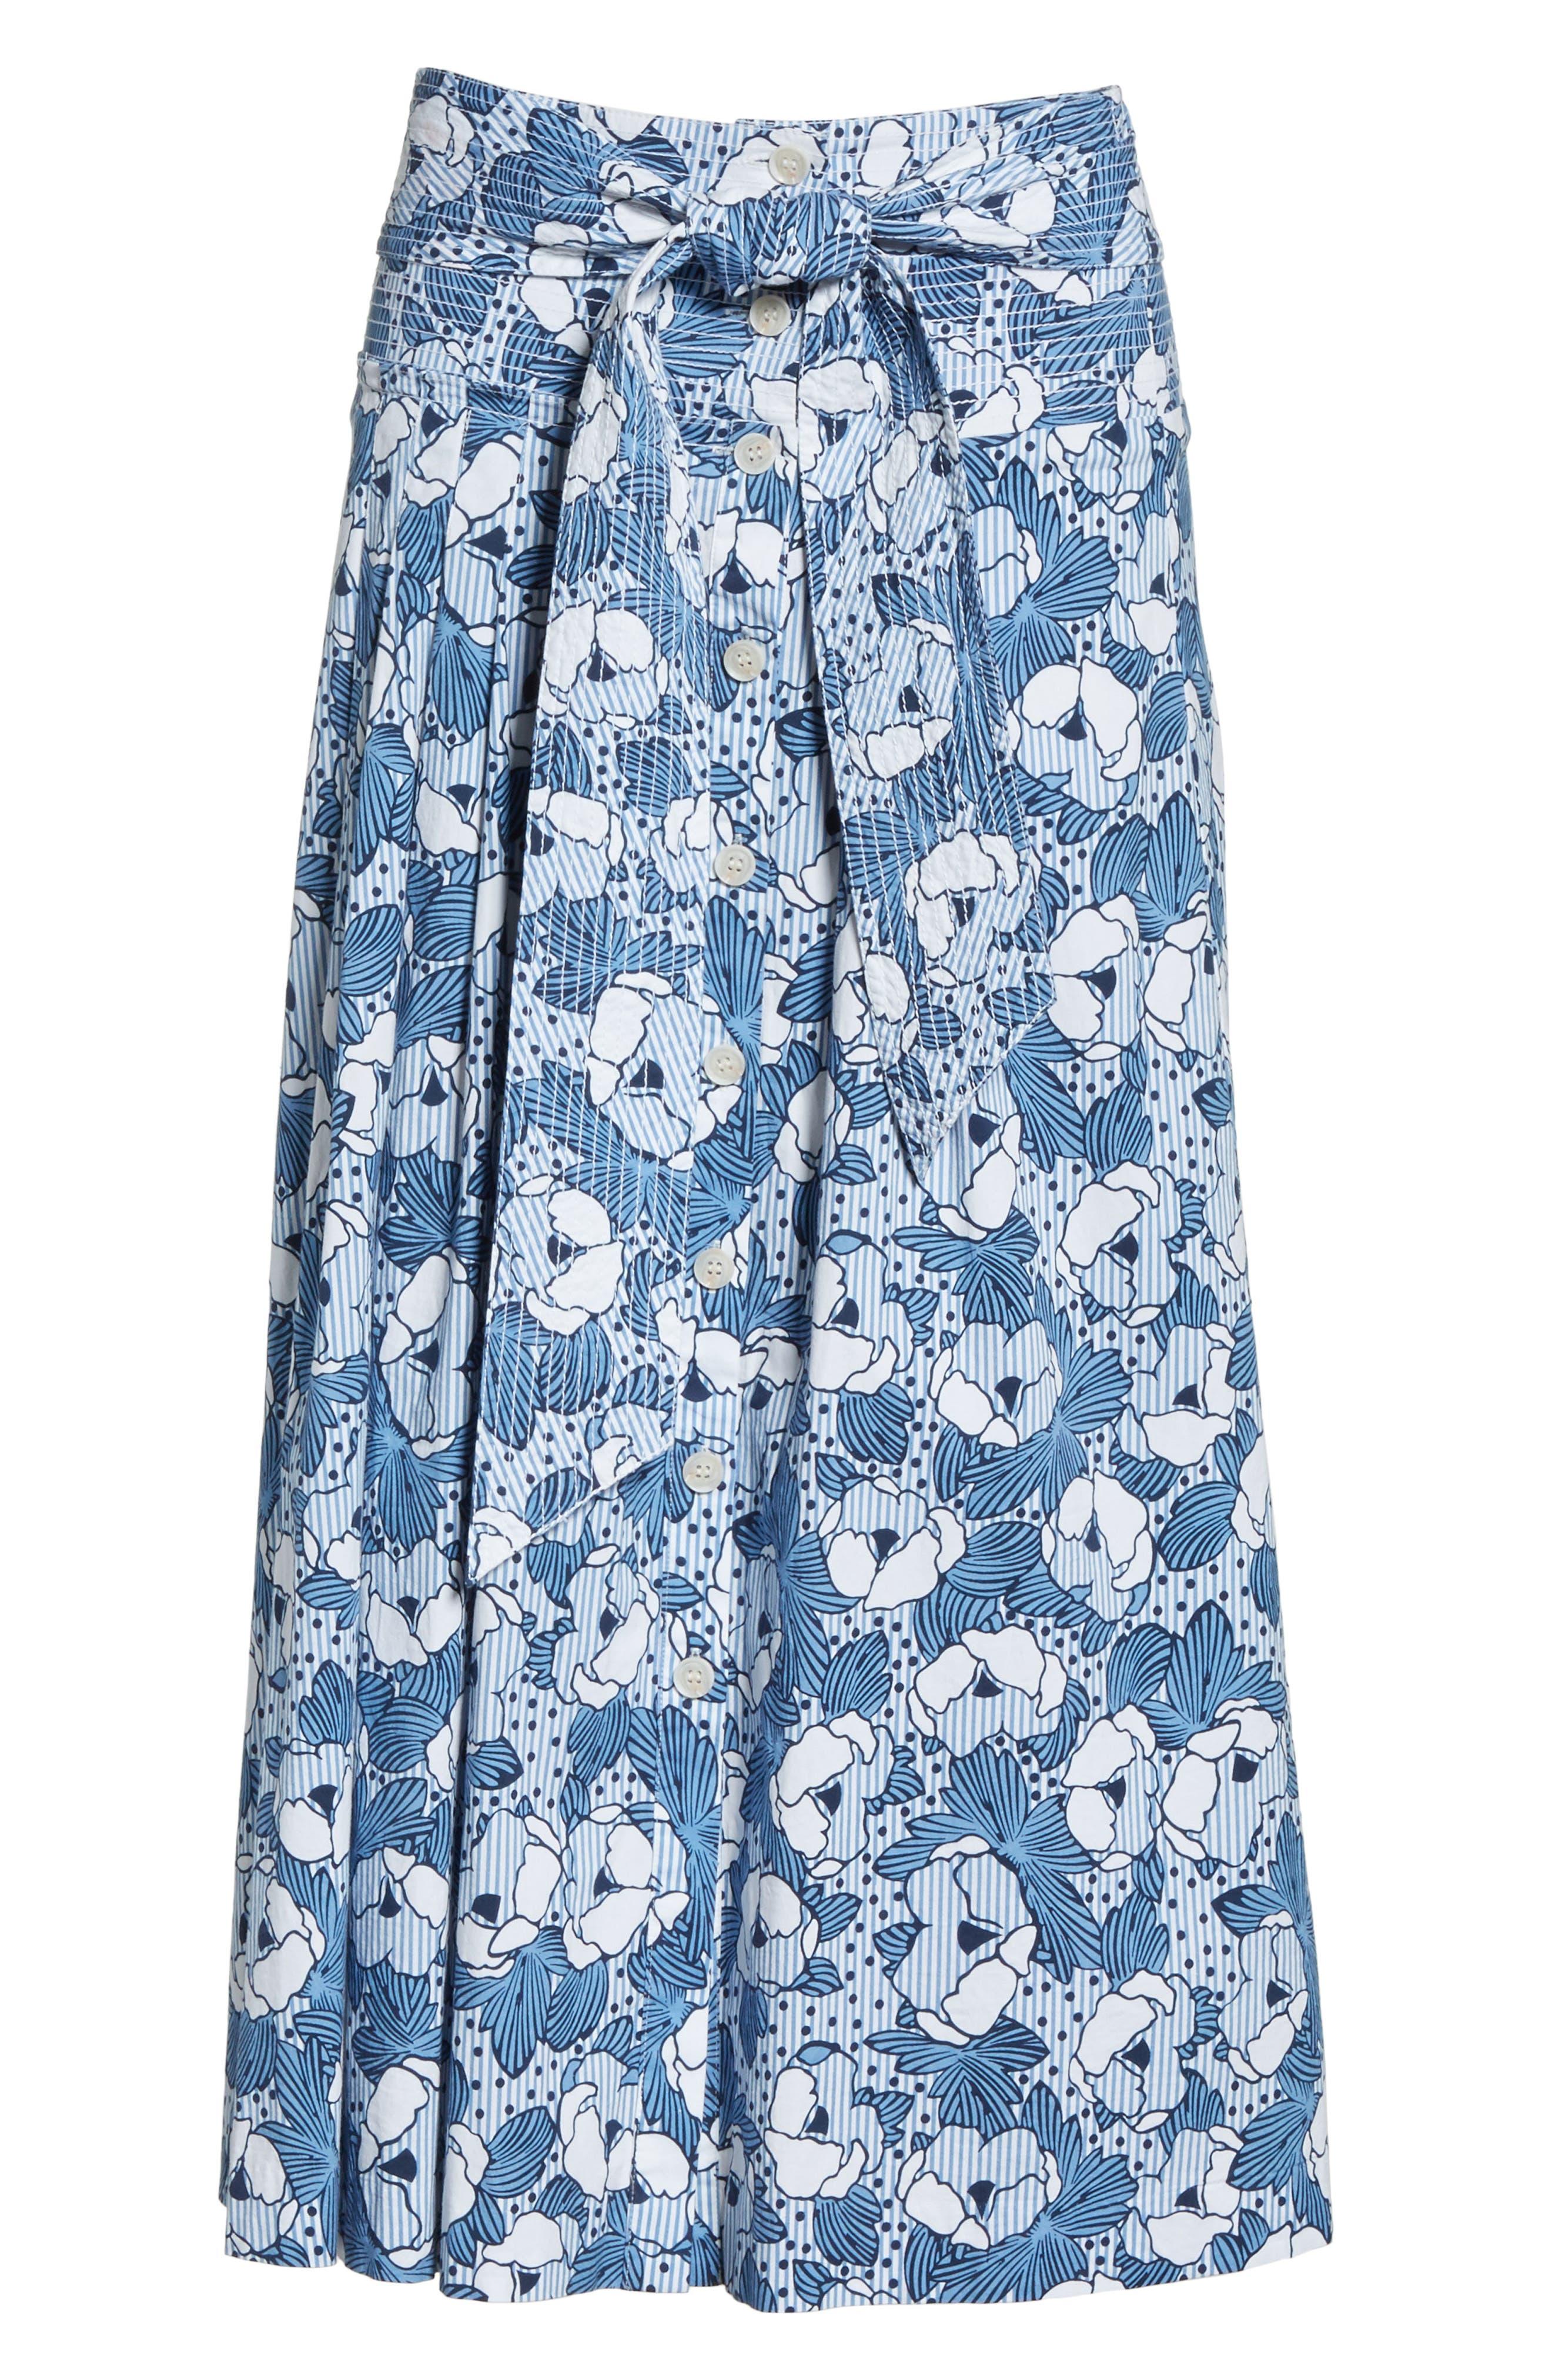 Caralina Floral Print Midi Skirt,                             Alternate thumbnail 6, color,                             Blue/ White